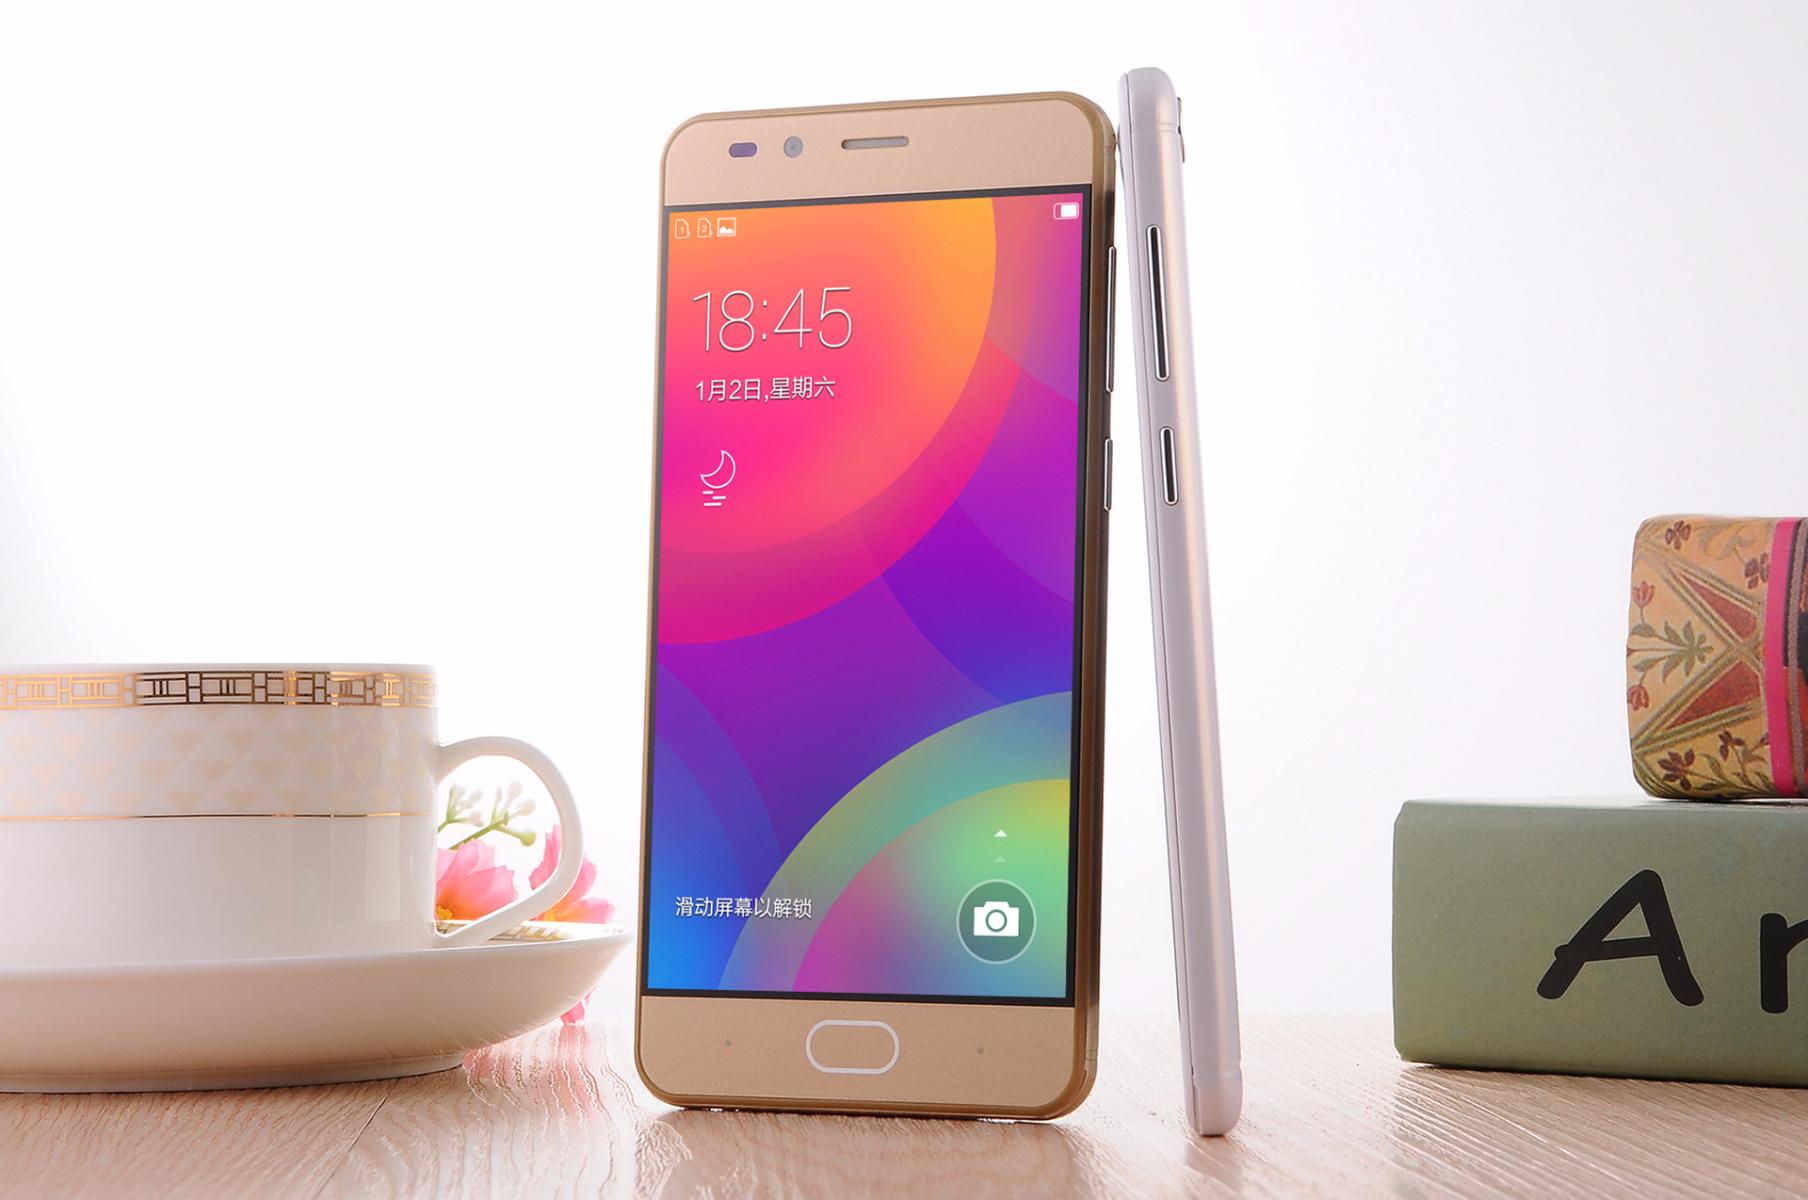 Heeyu LEZU R9U9 4.7 Inch 3G Smartphone Support Dual Card Multi-language